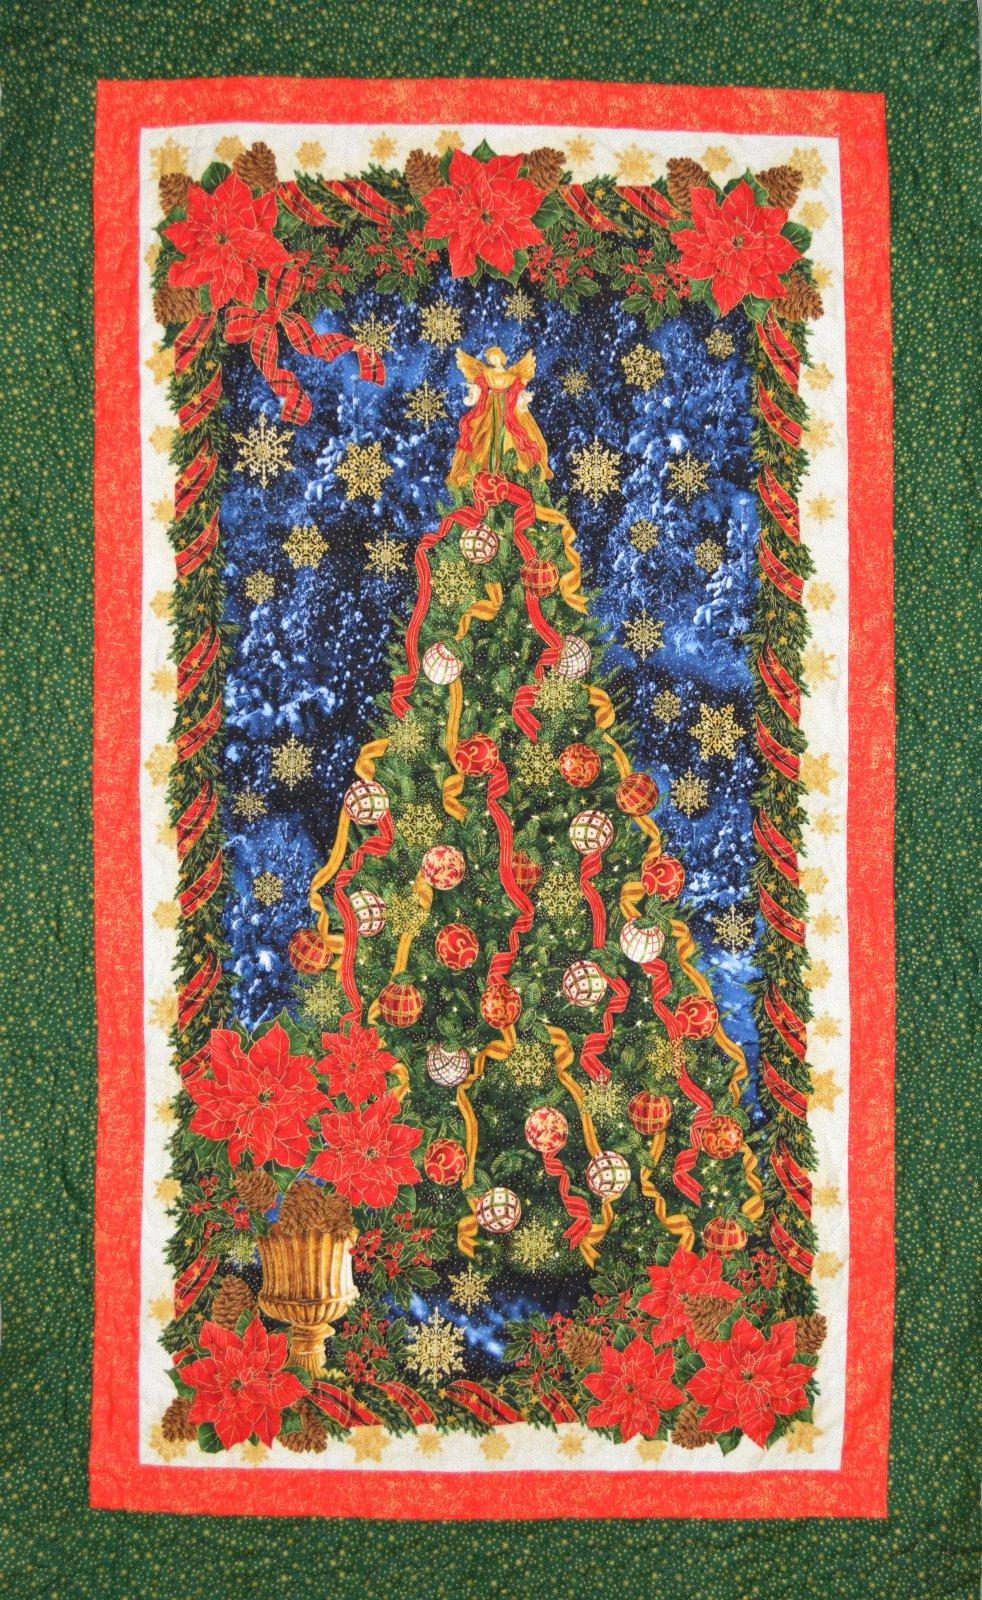 Christmas Tree Panel Quilt